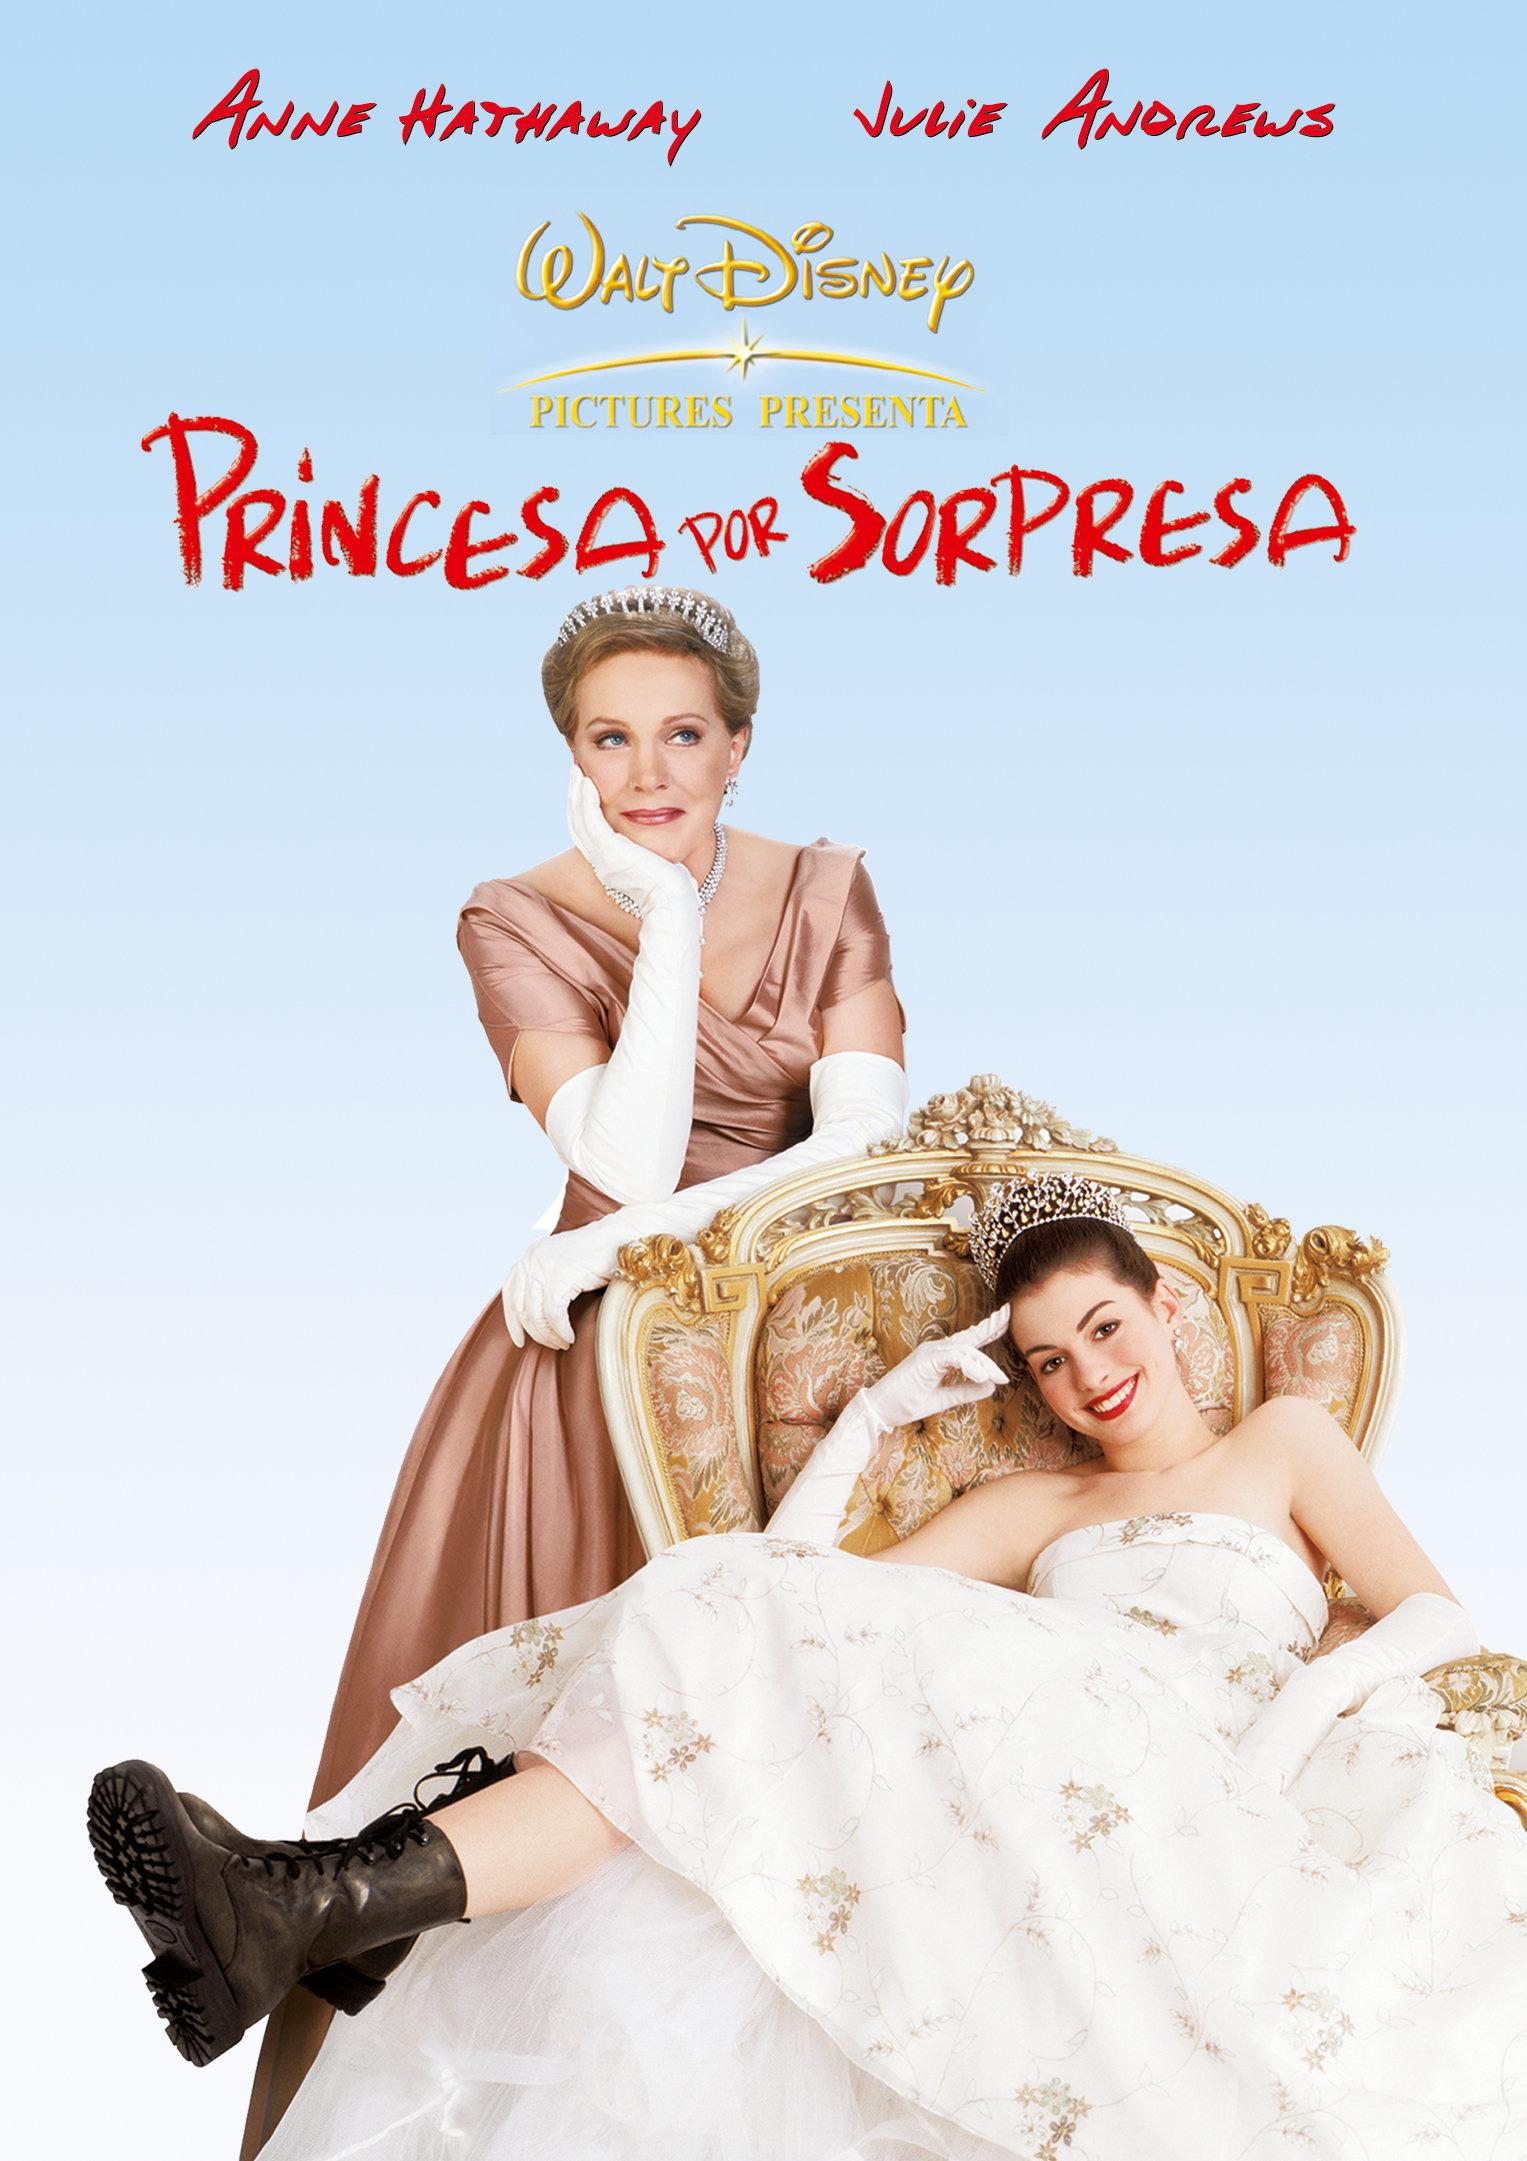 Princesa por sorpresa